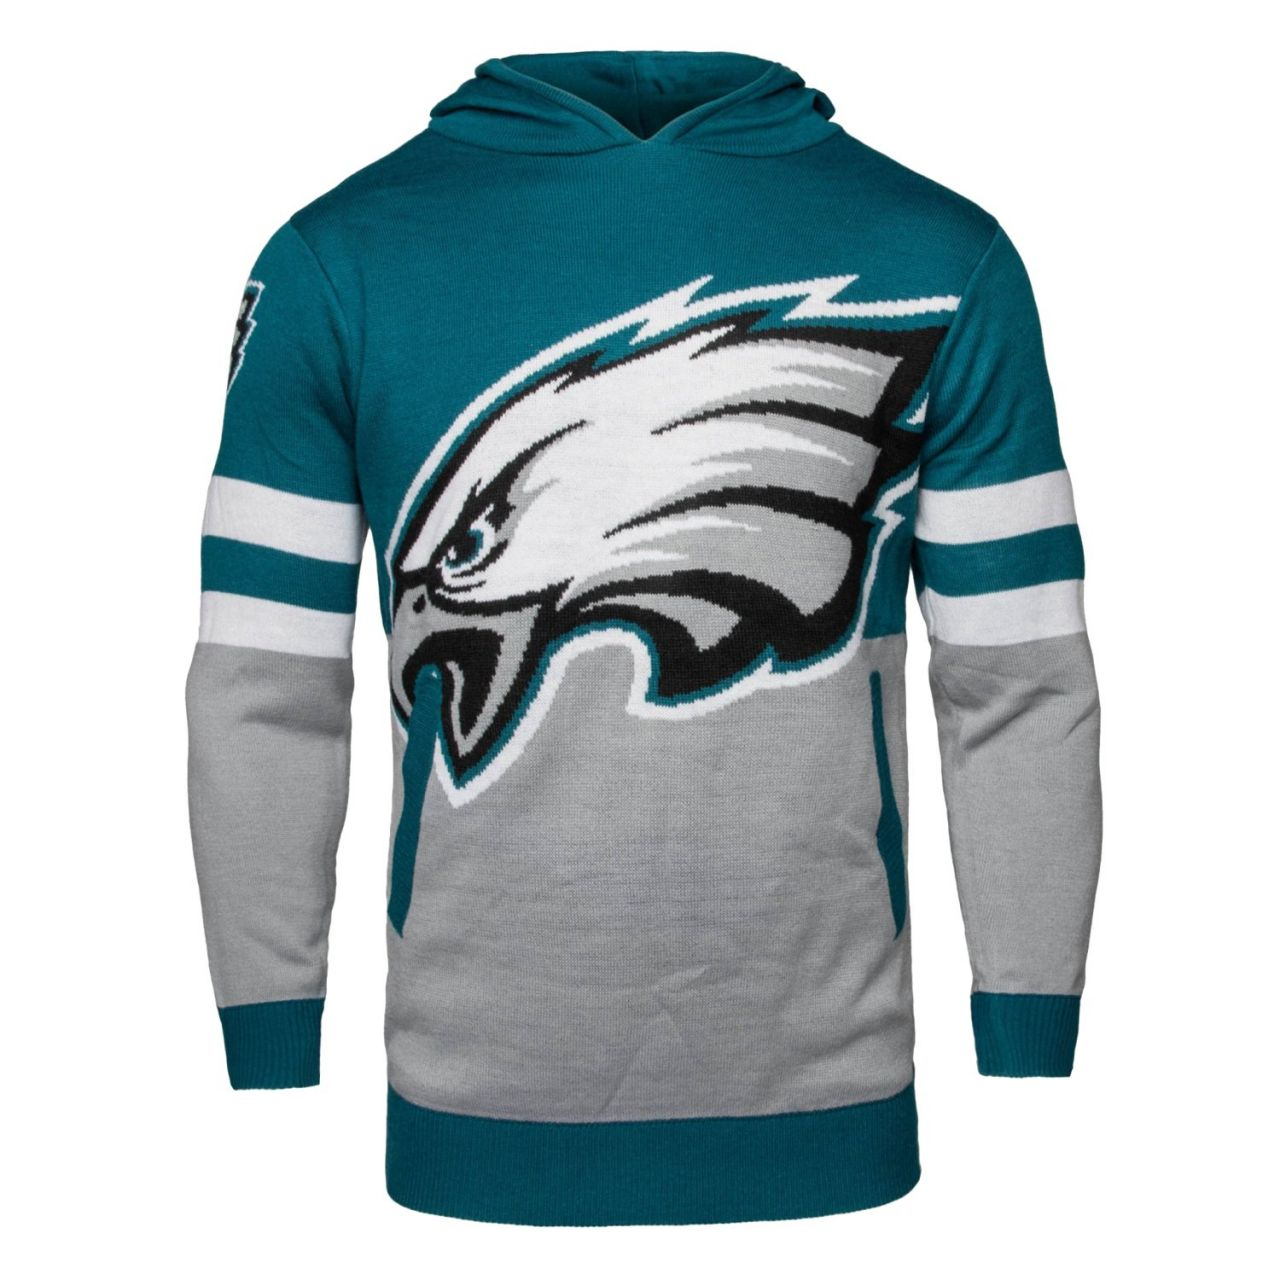 amfoo - NFL Ugly Sweater Big Logo Hoody - Philadelphia Eagles